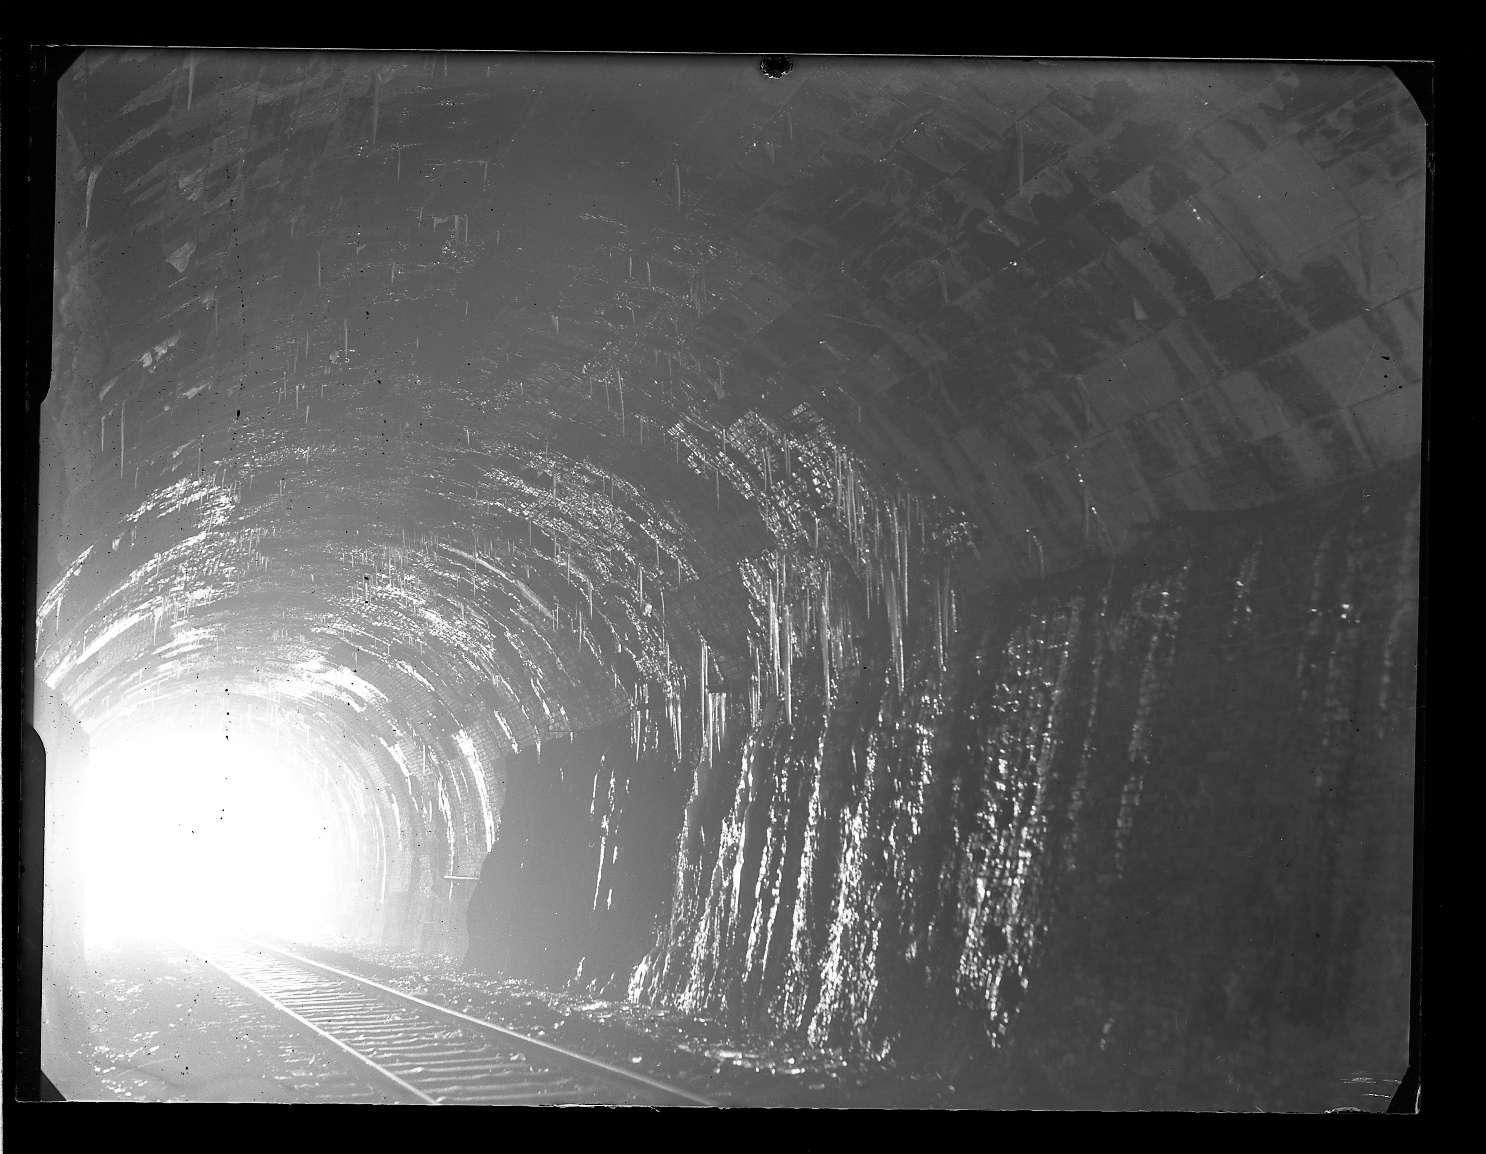 Itzelberg, Bf, Tunnelausbau und Abdichtung (Innenaufnahmen), Abb. a